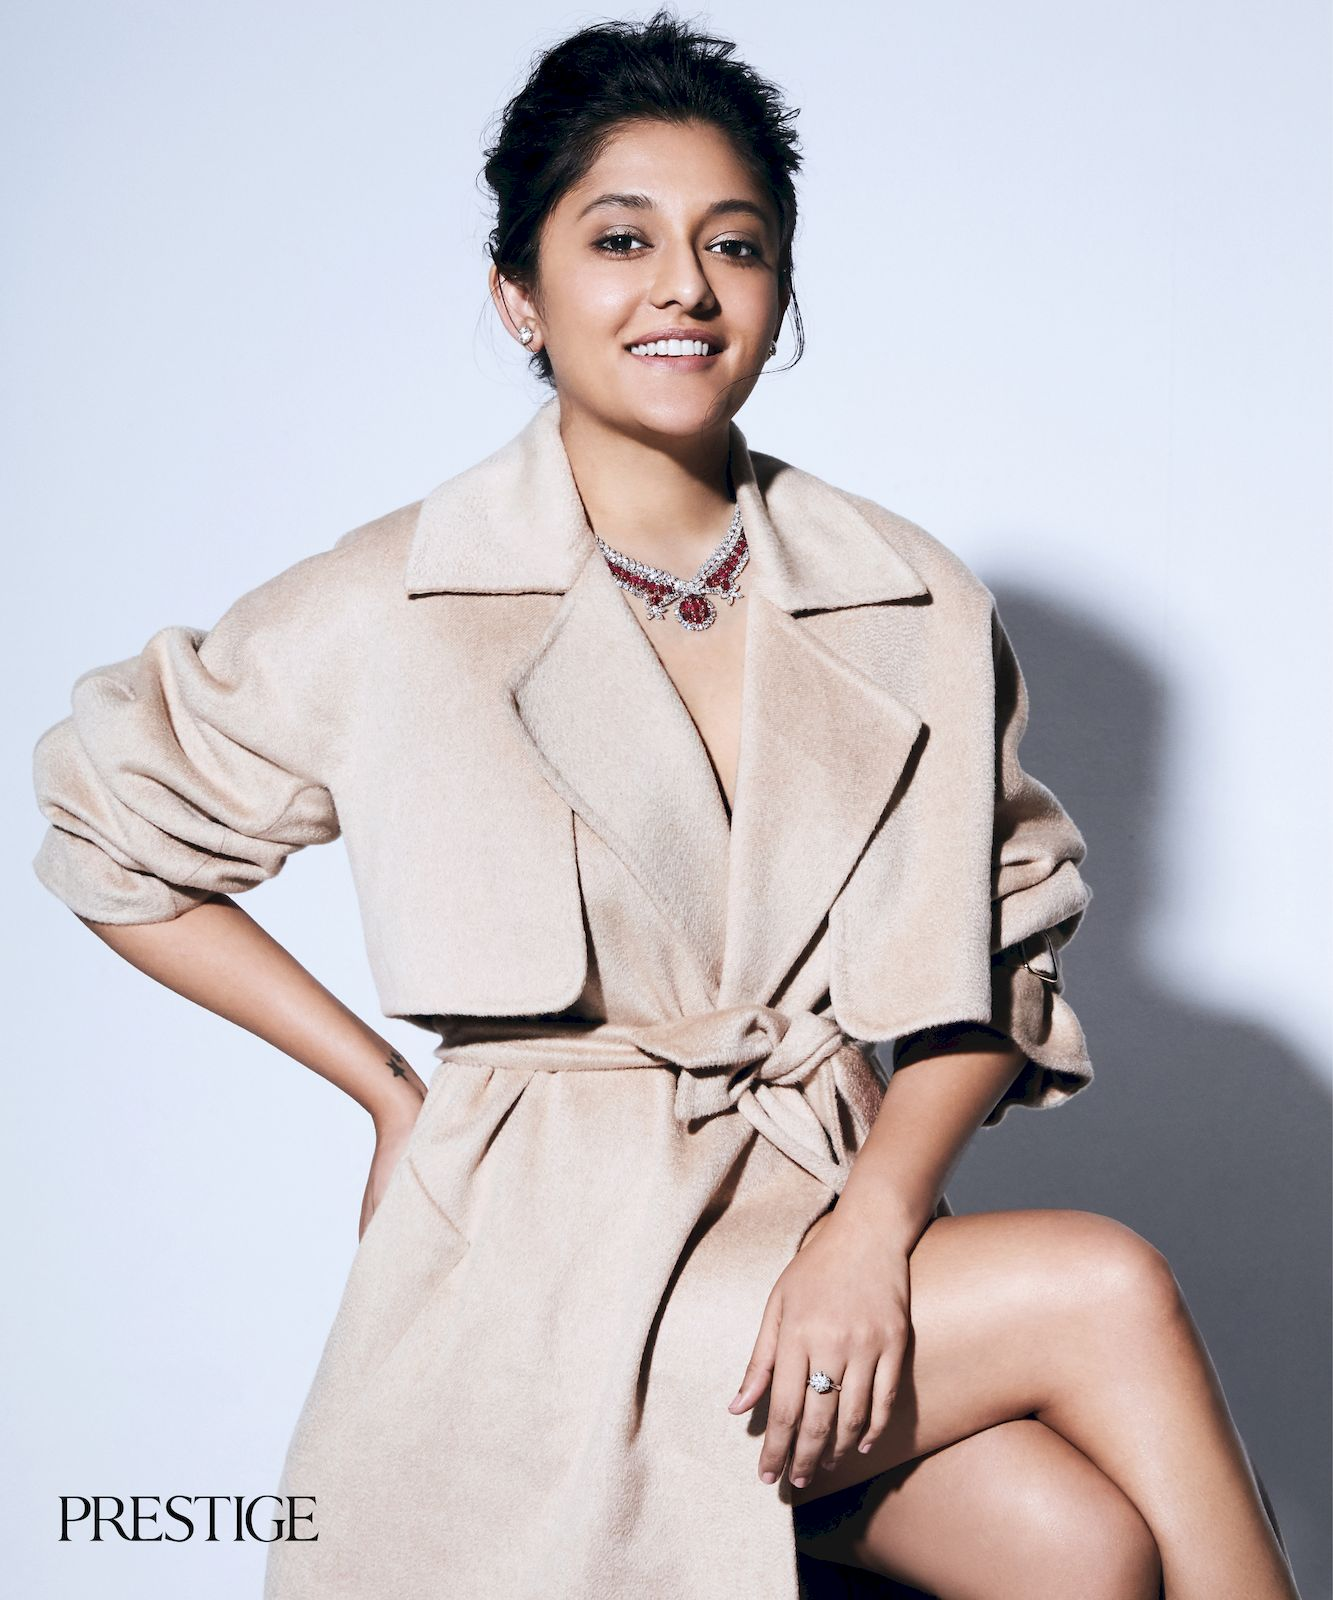 Vihari Poddar is bringing a renewed vim and vigour into her jewellery line